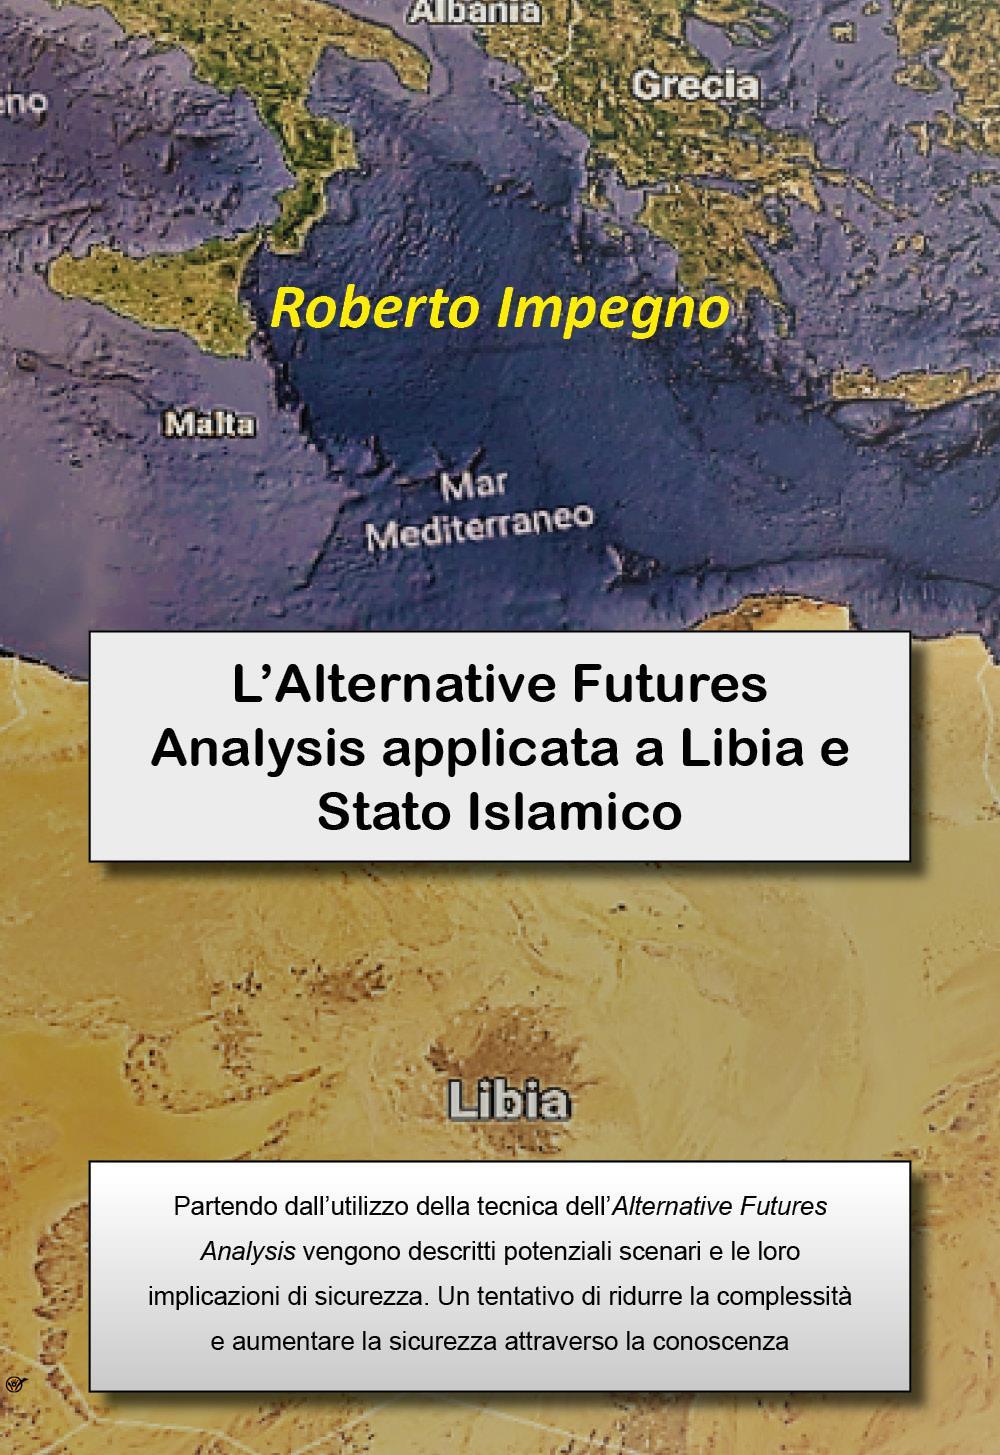 L'Alternative Futures Analysis applicata a Libia e Stato Islamico